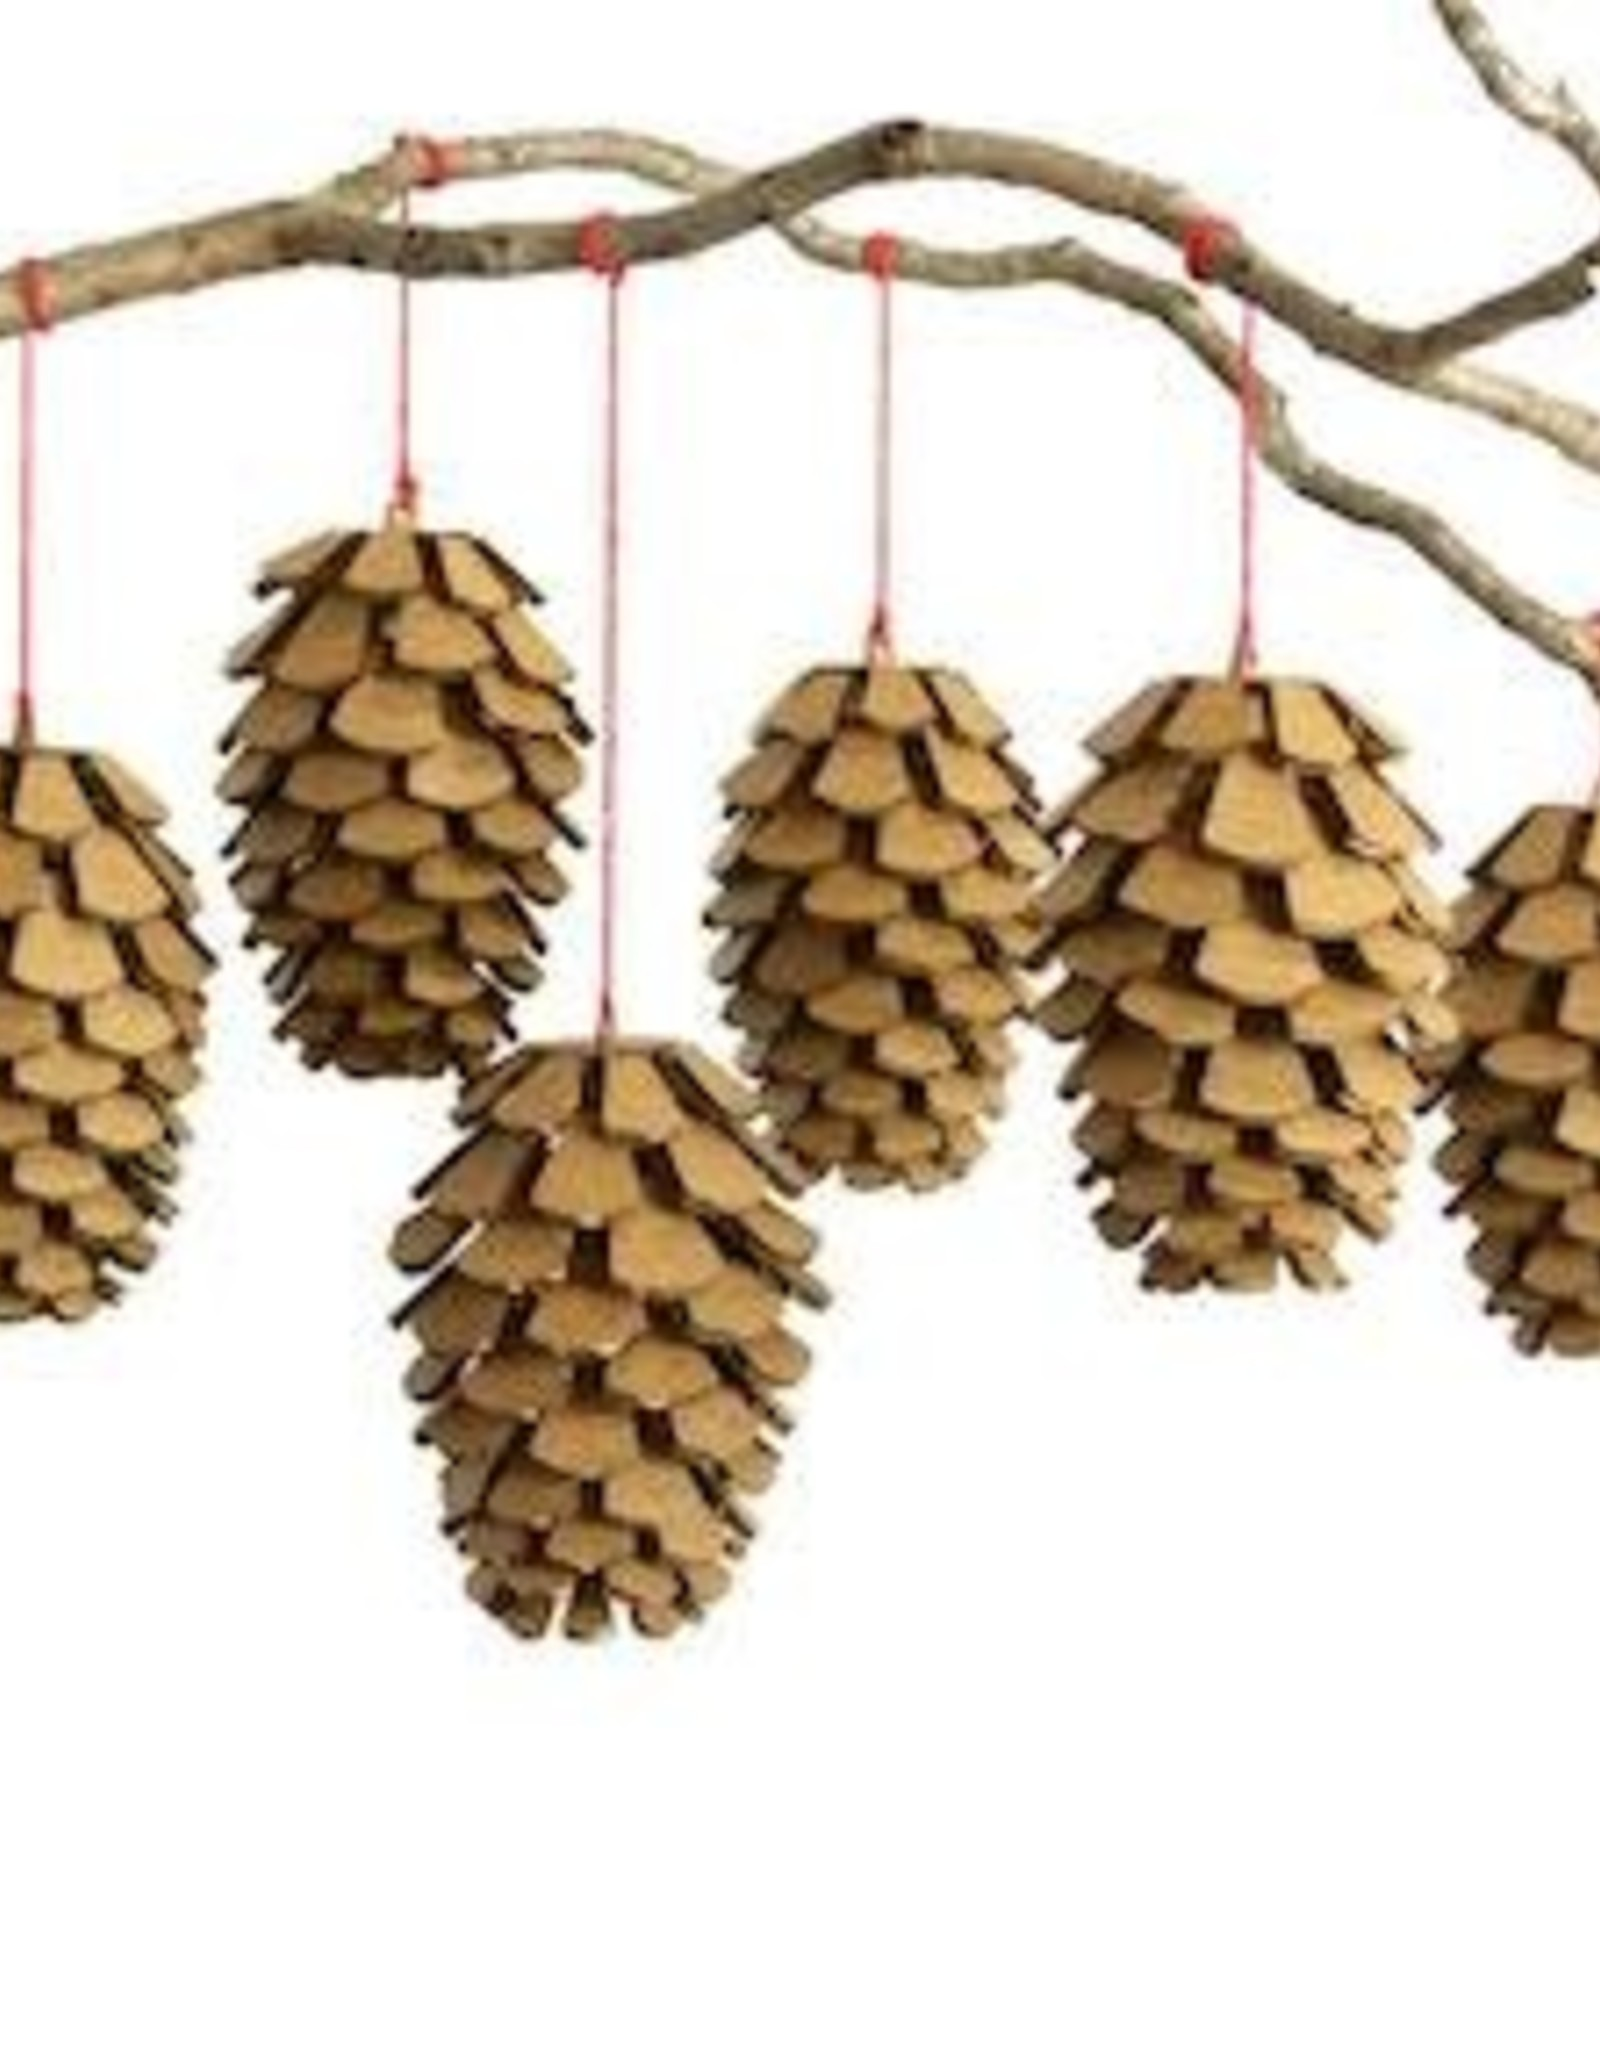 Cardboard Safari Cardboard Safari Pine Cones Set of Six - brown